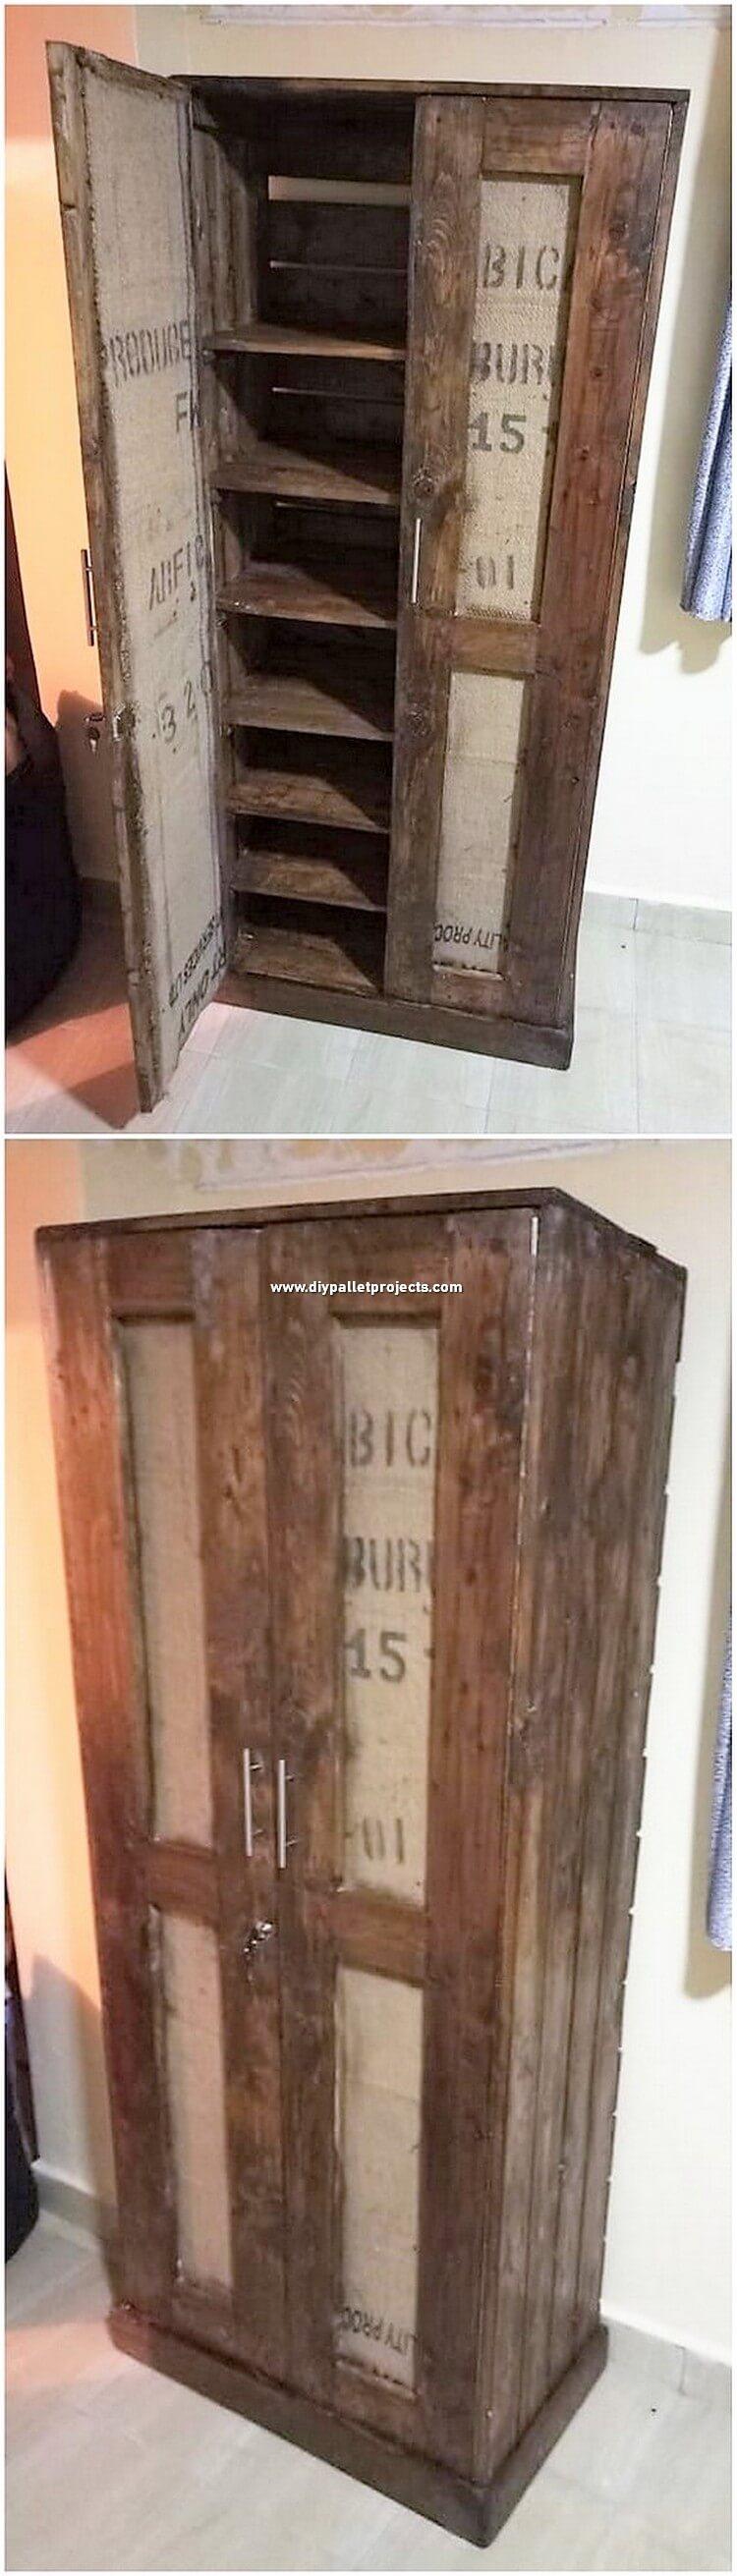 Pallet Wooden Cabinet